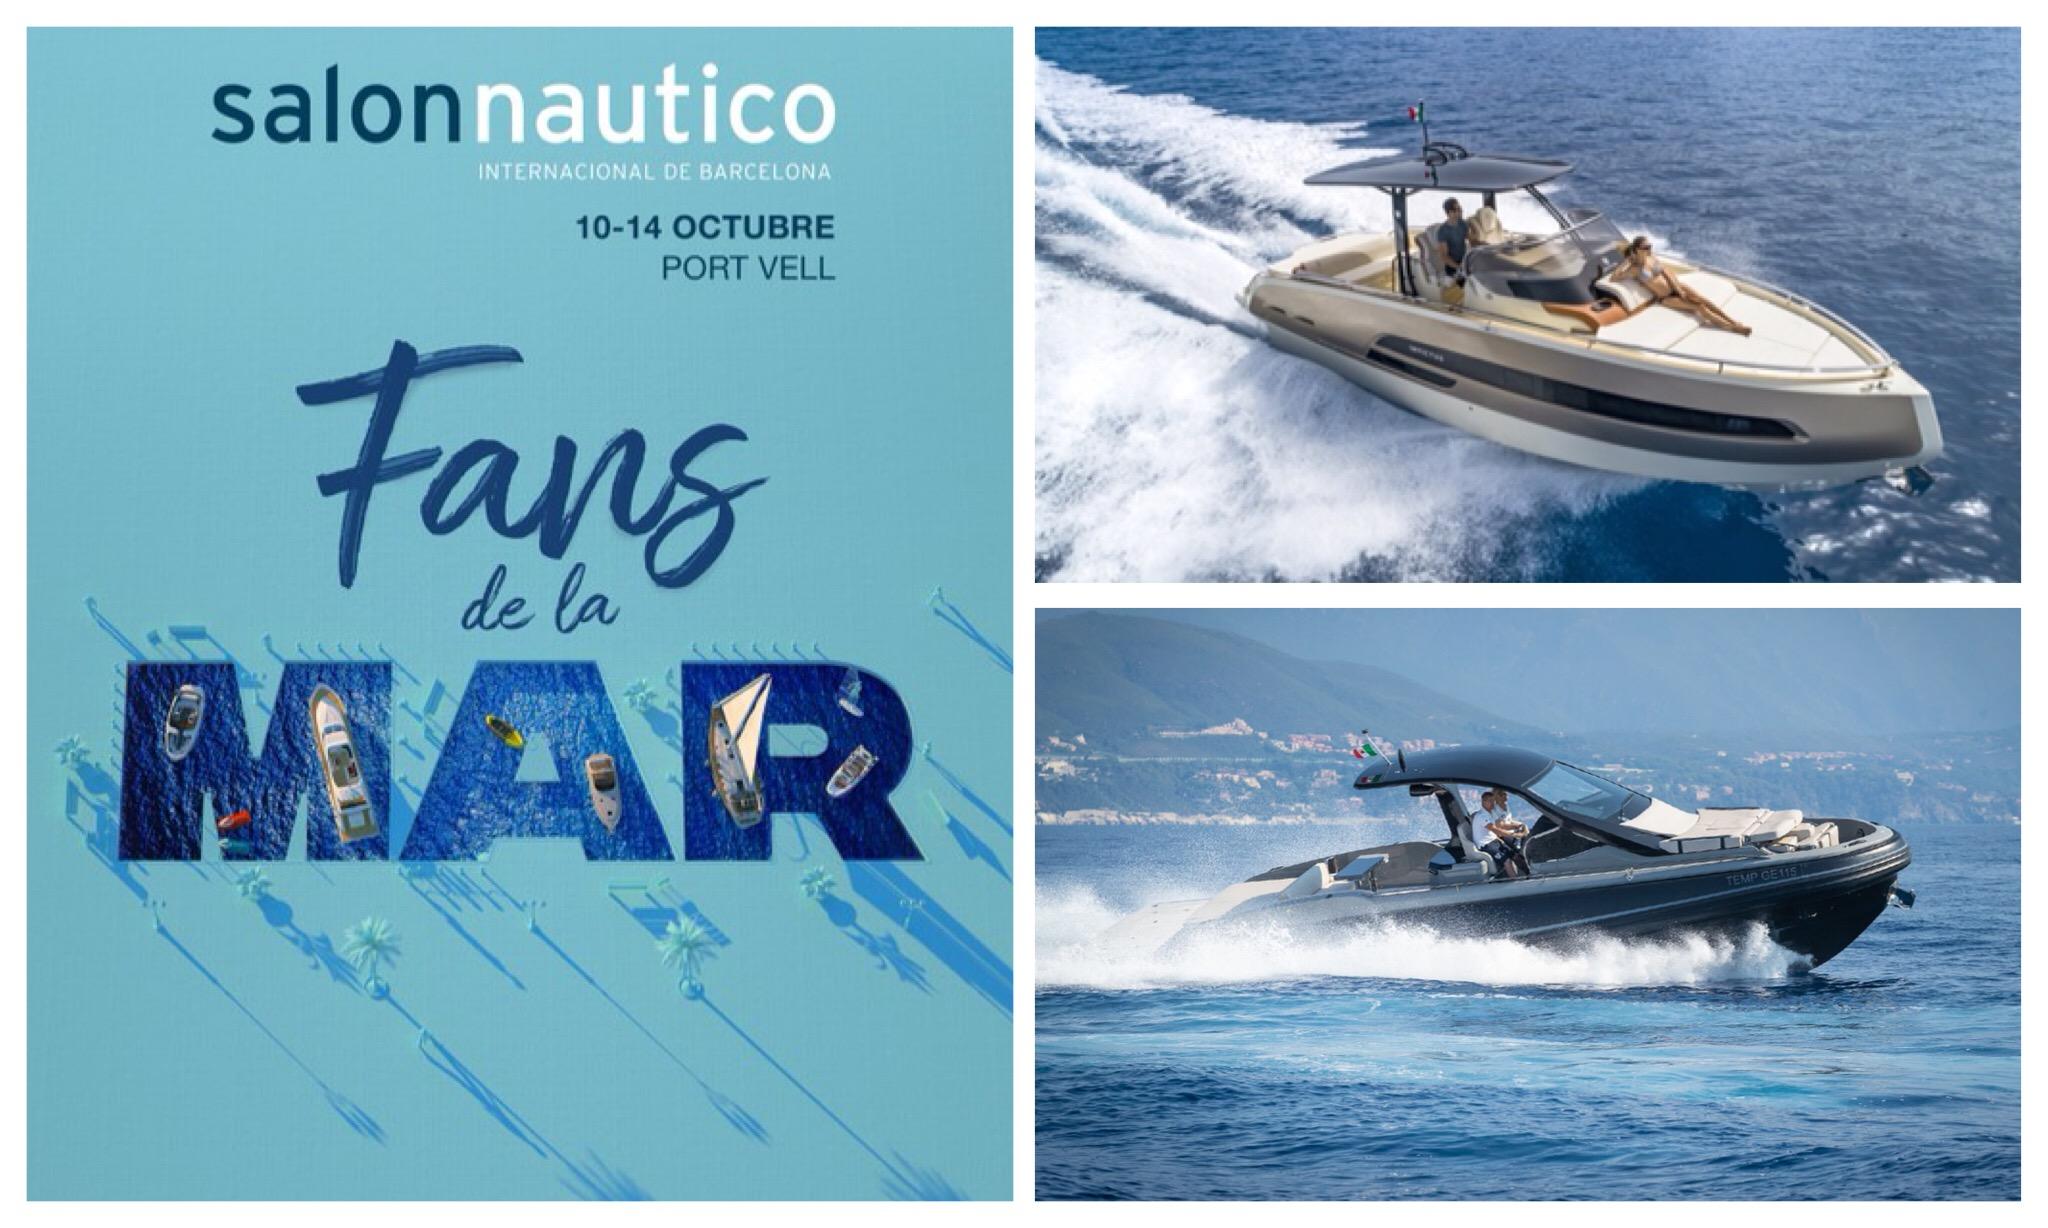 Salon Nautico Barclona 18